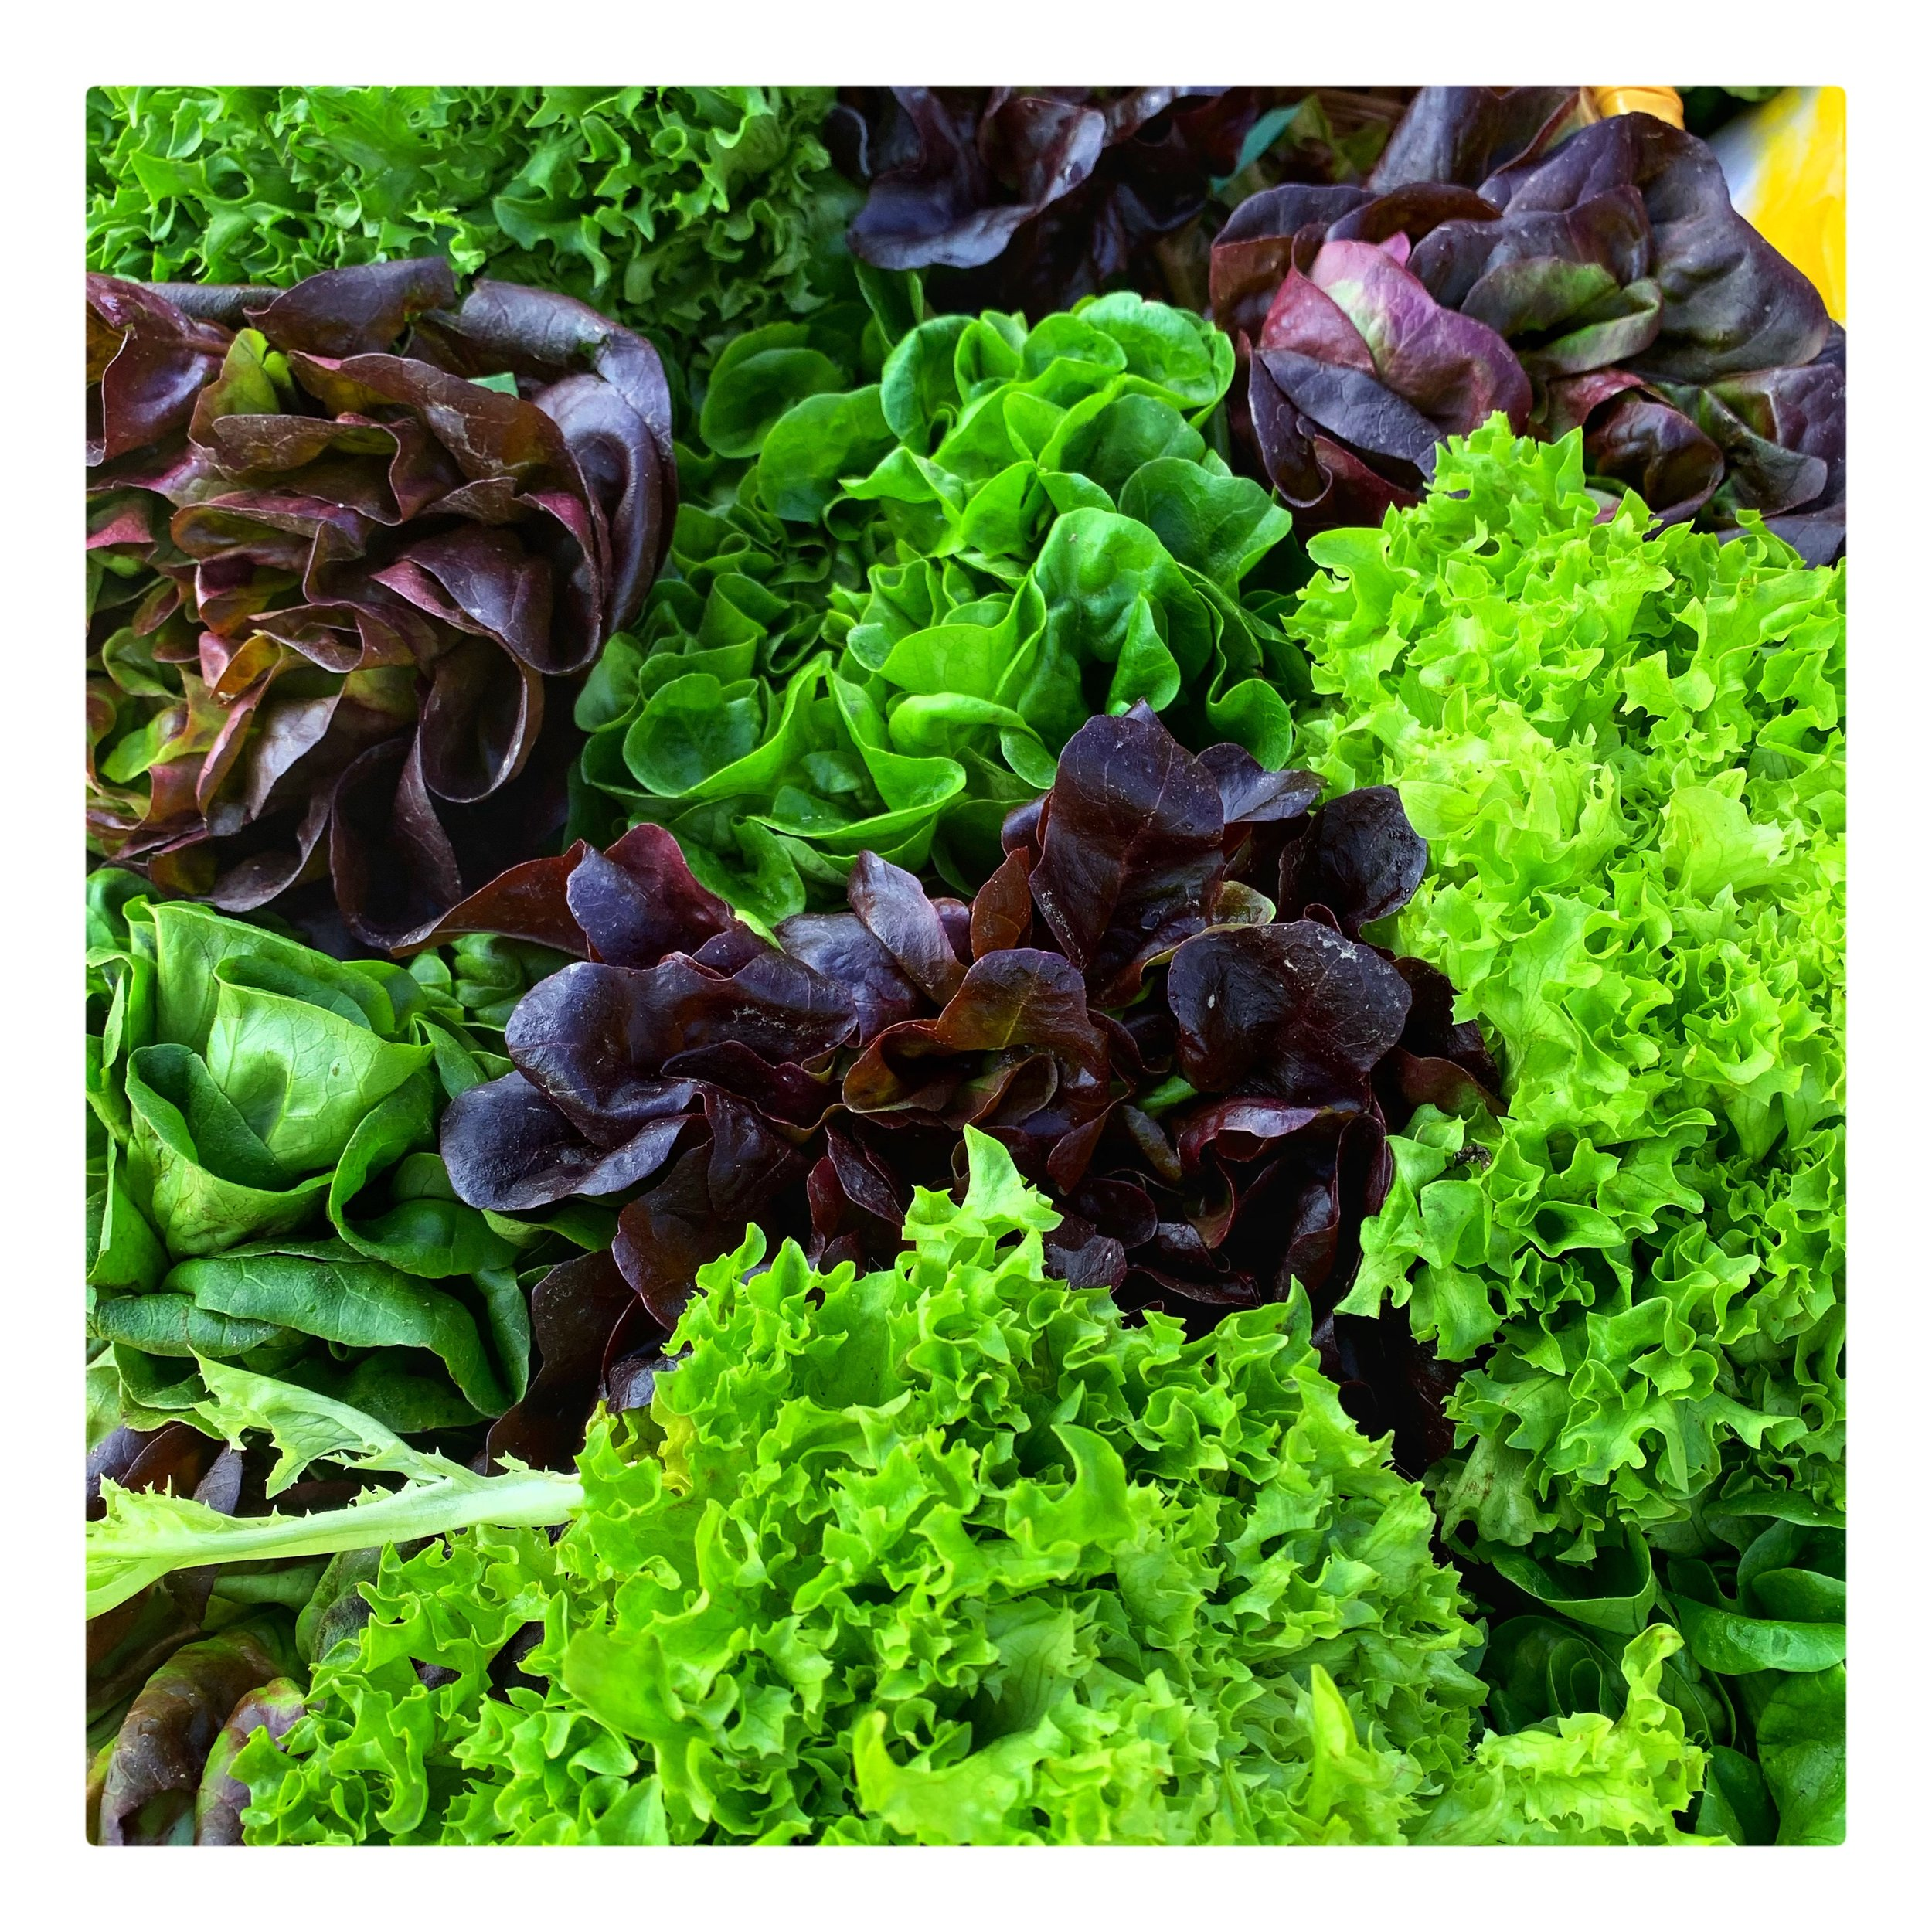 Organic locally grown lettuce